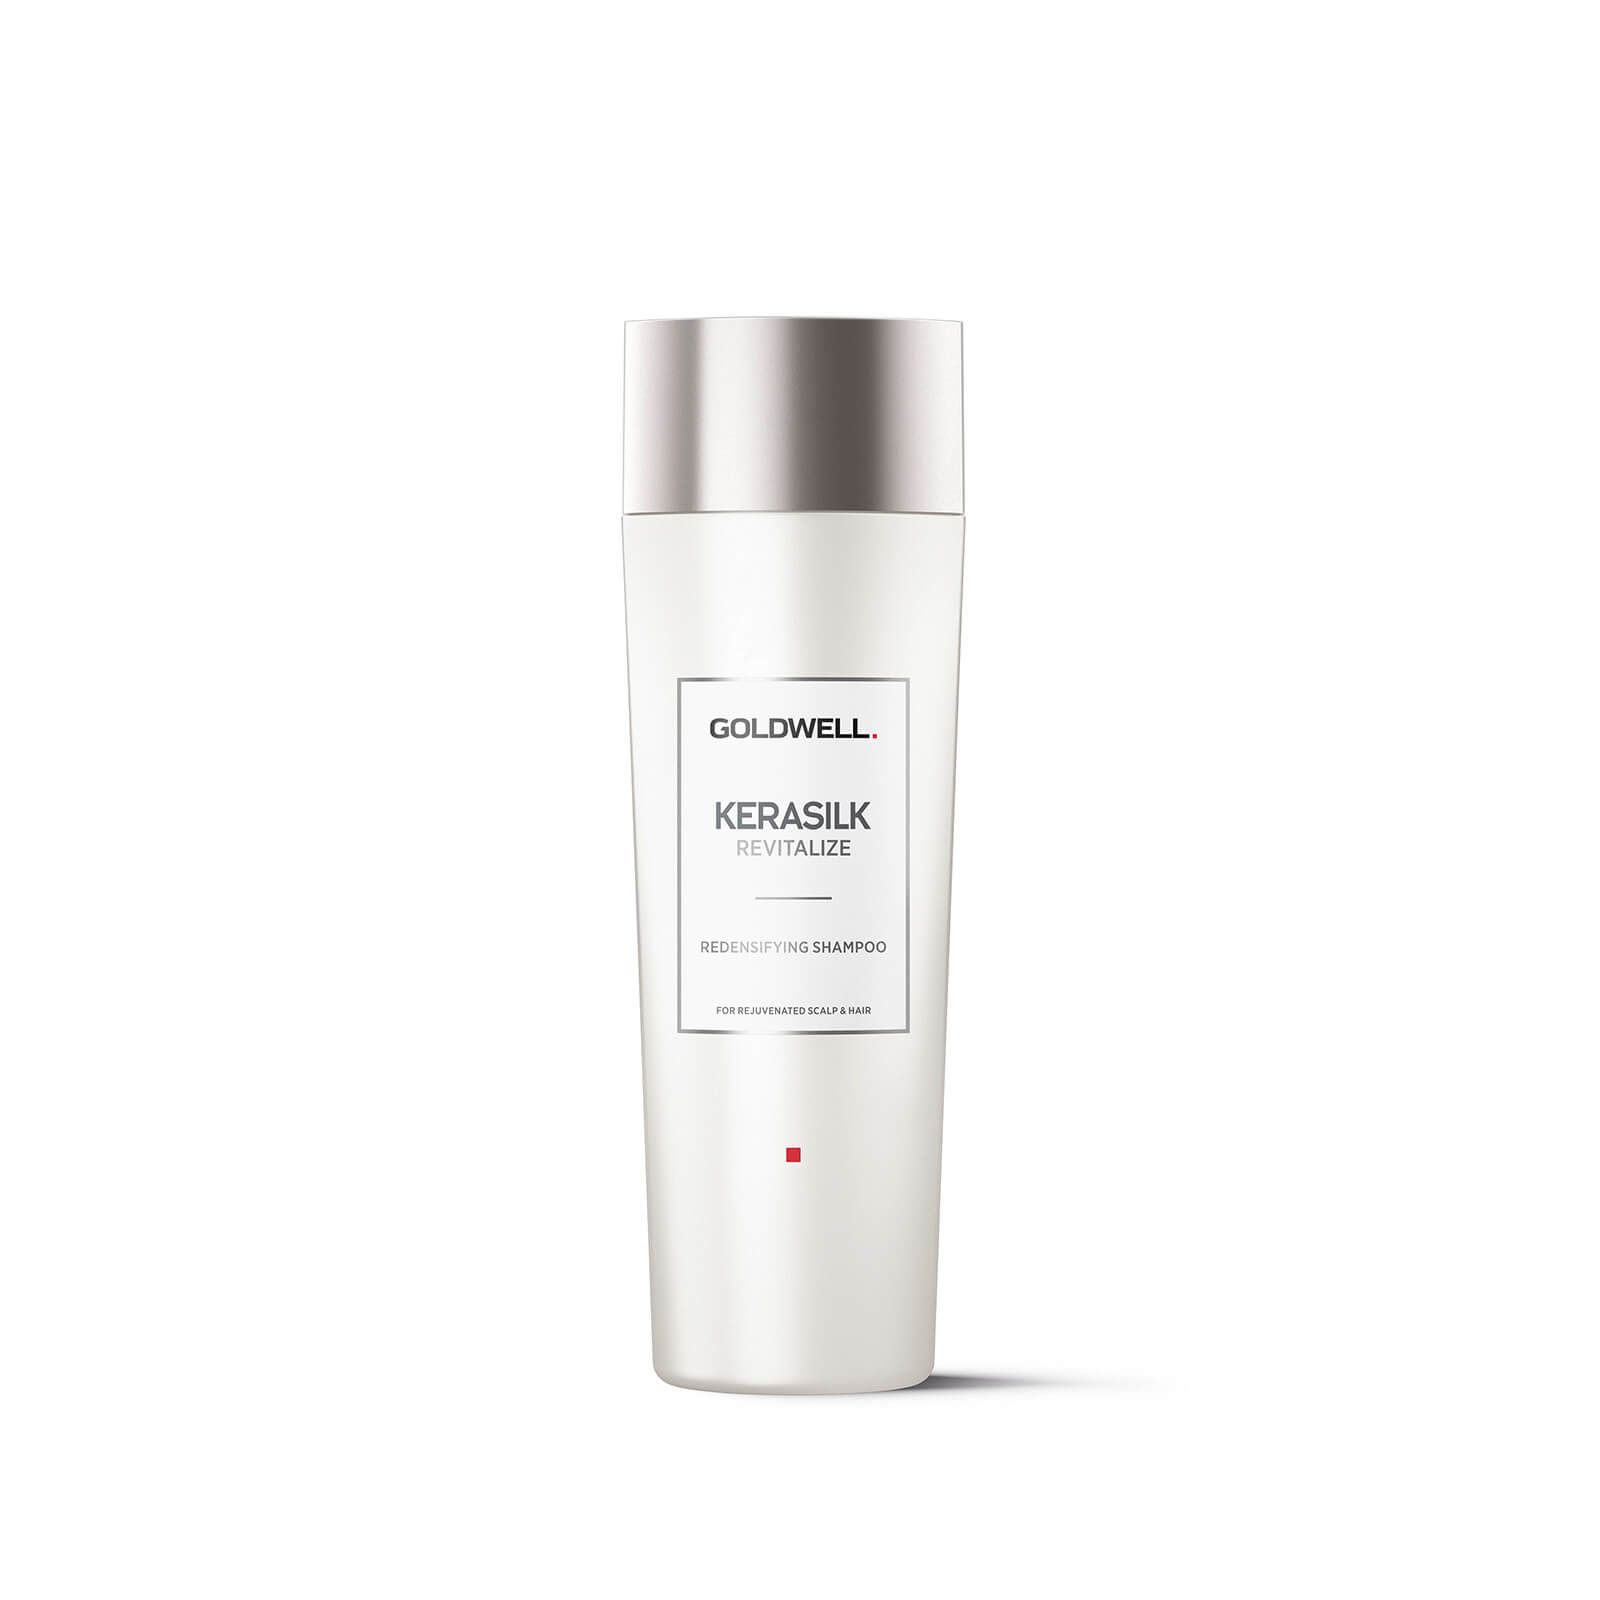 Купить Goldwell Kerasilk Revitalize Redensifying Shampoo 250ml